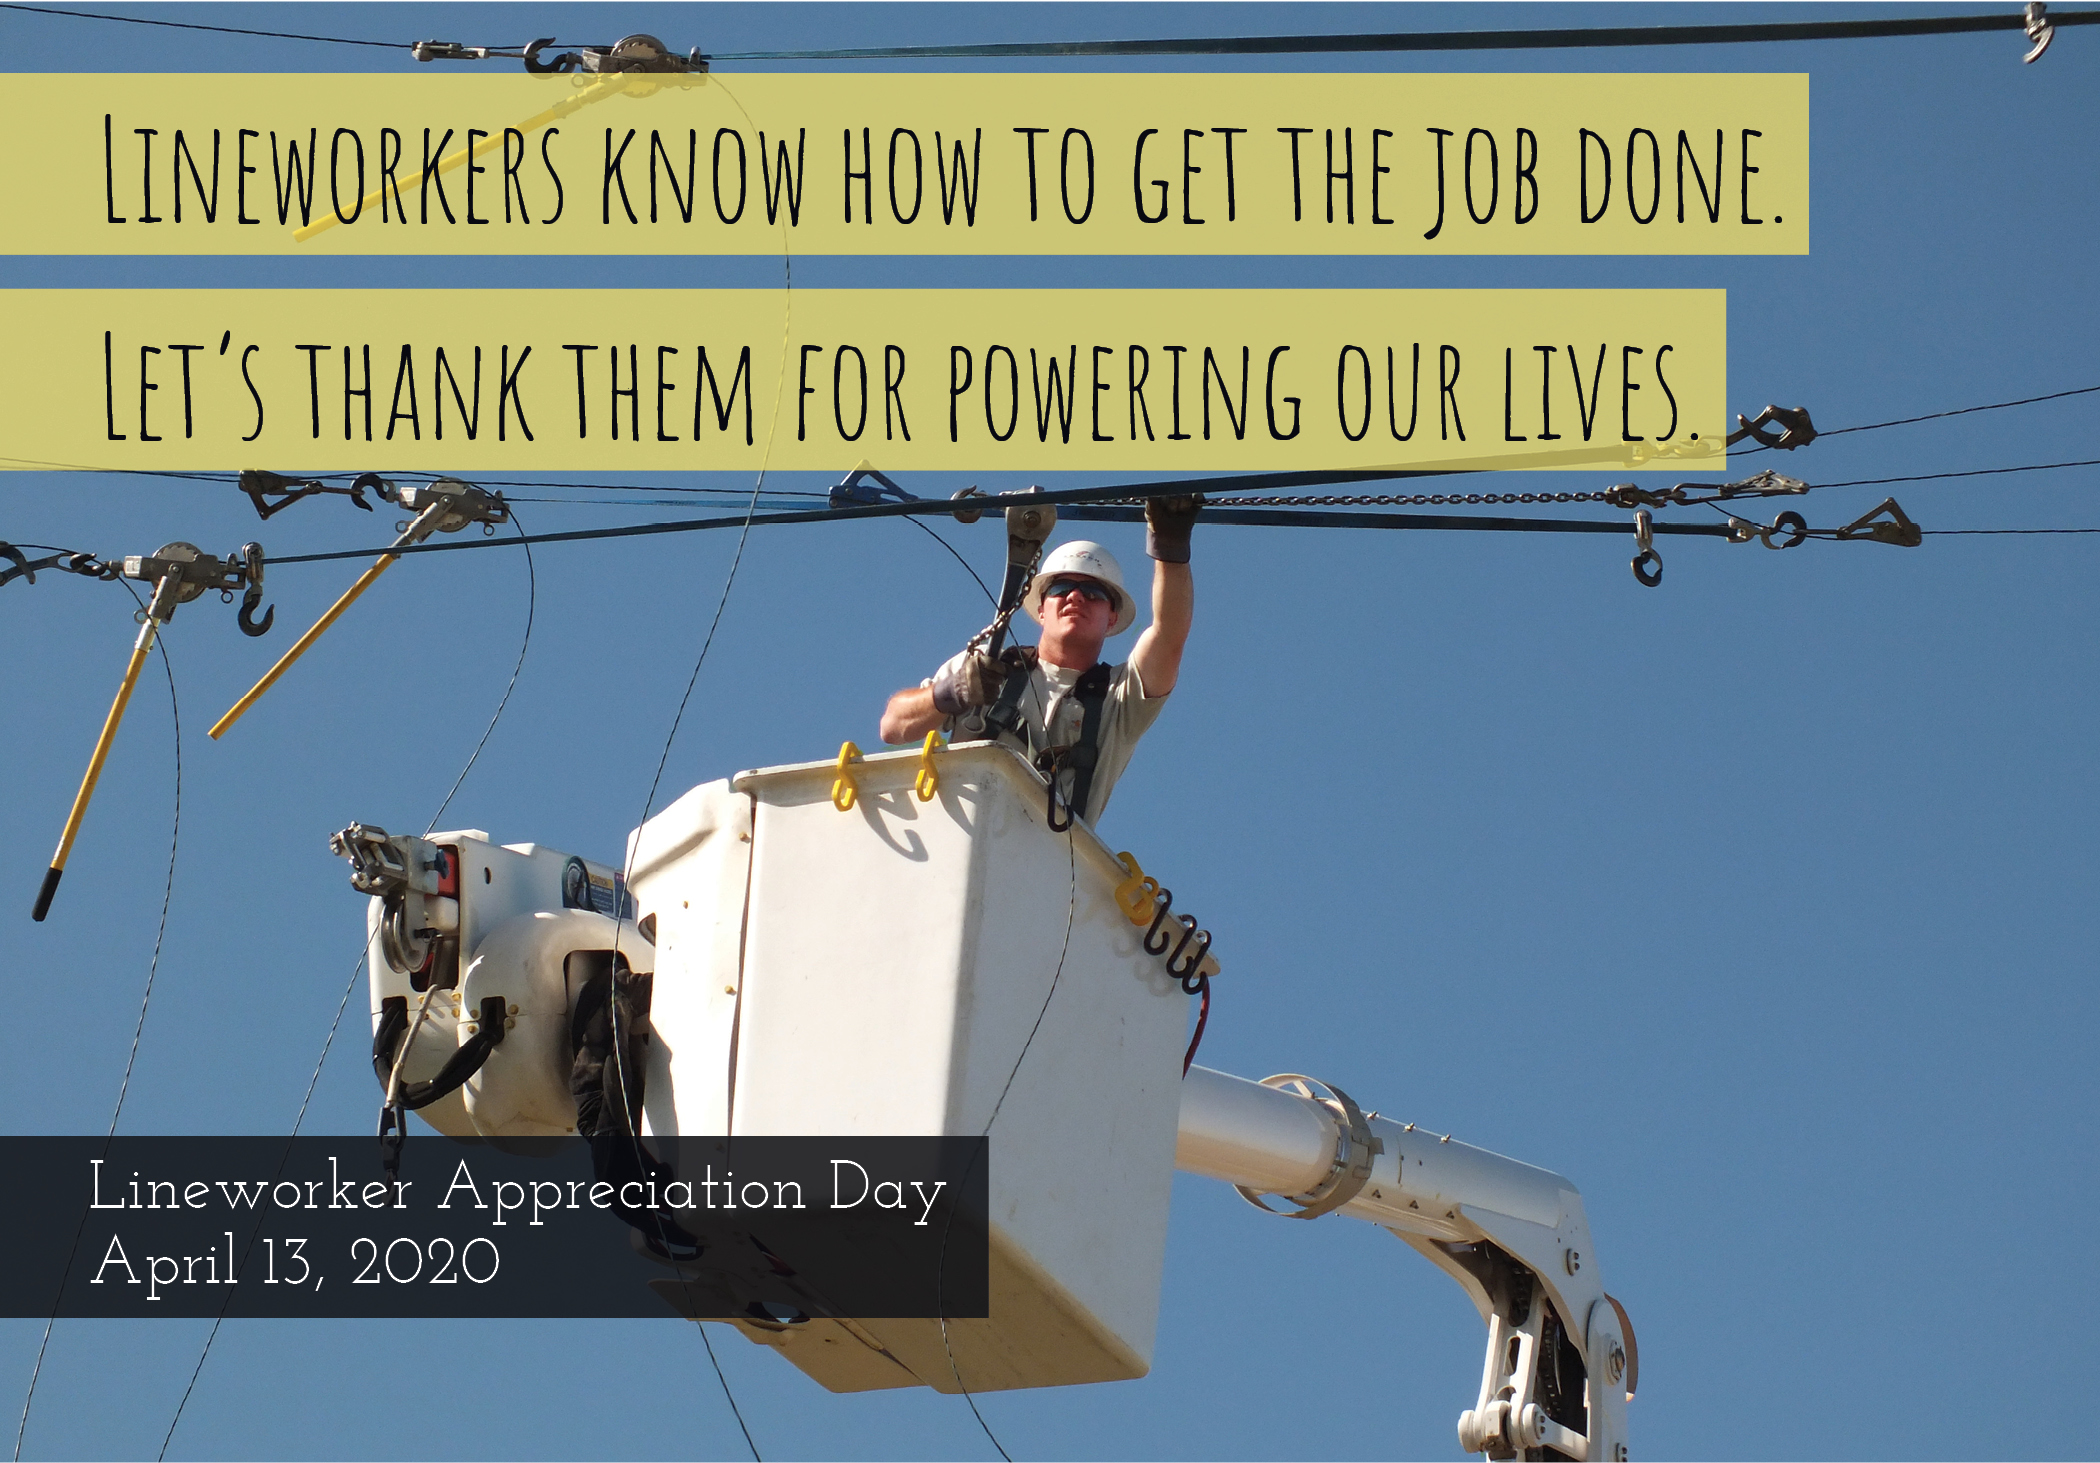 2020 Lineworker Appreciation Day